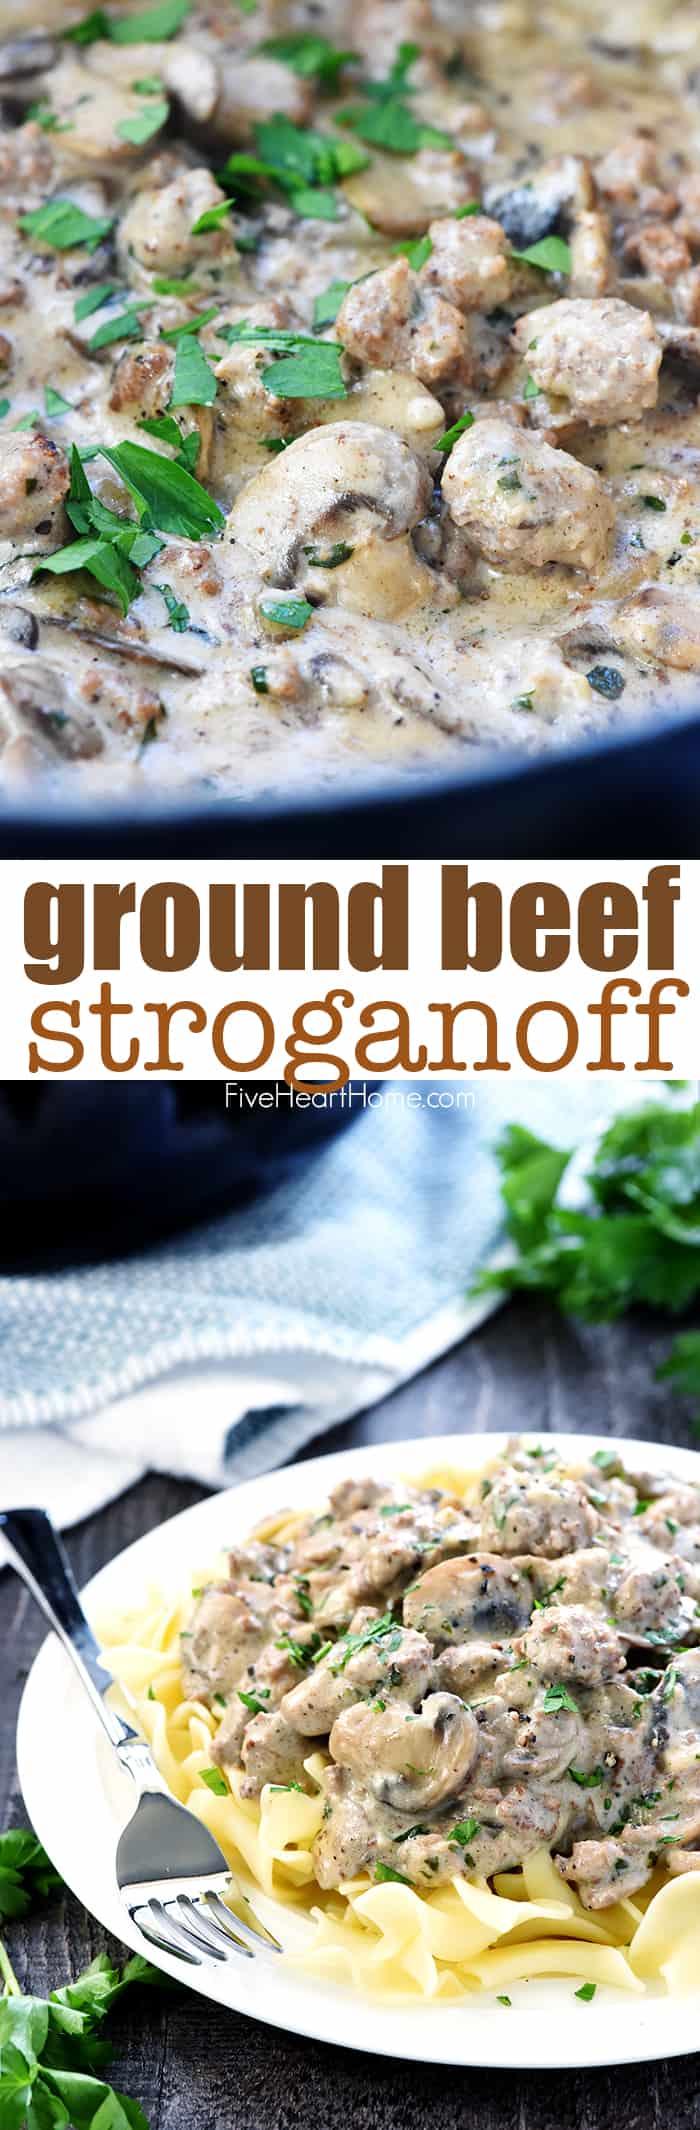 Ground Beef Stroganoff collage with text overlay